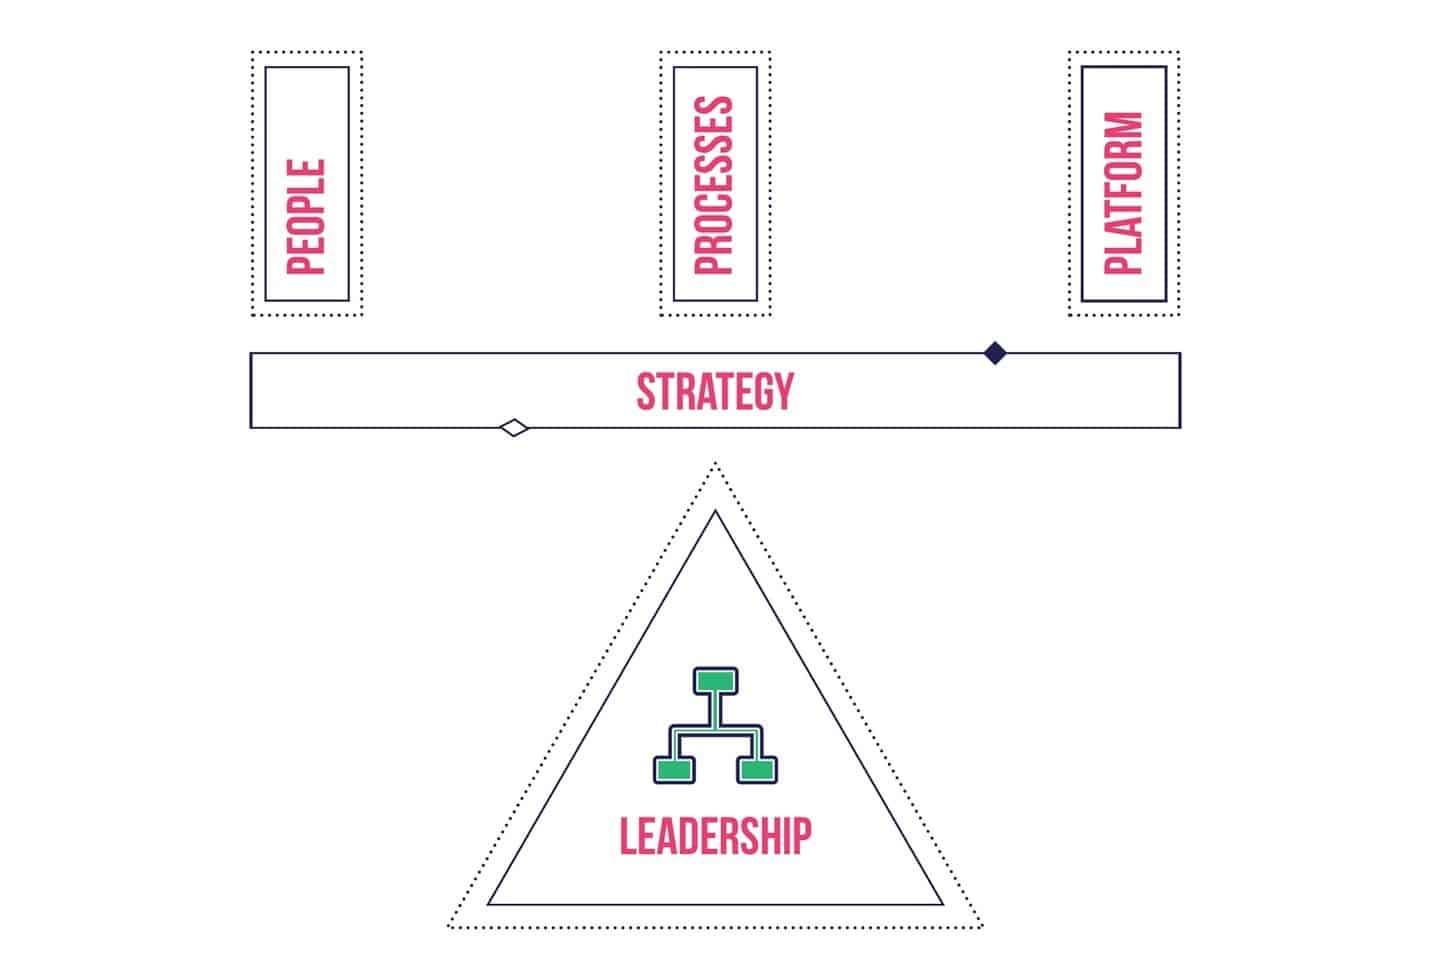 Customer centric model